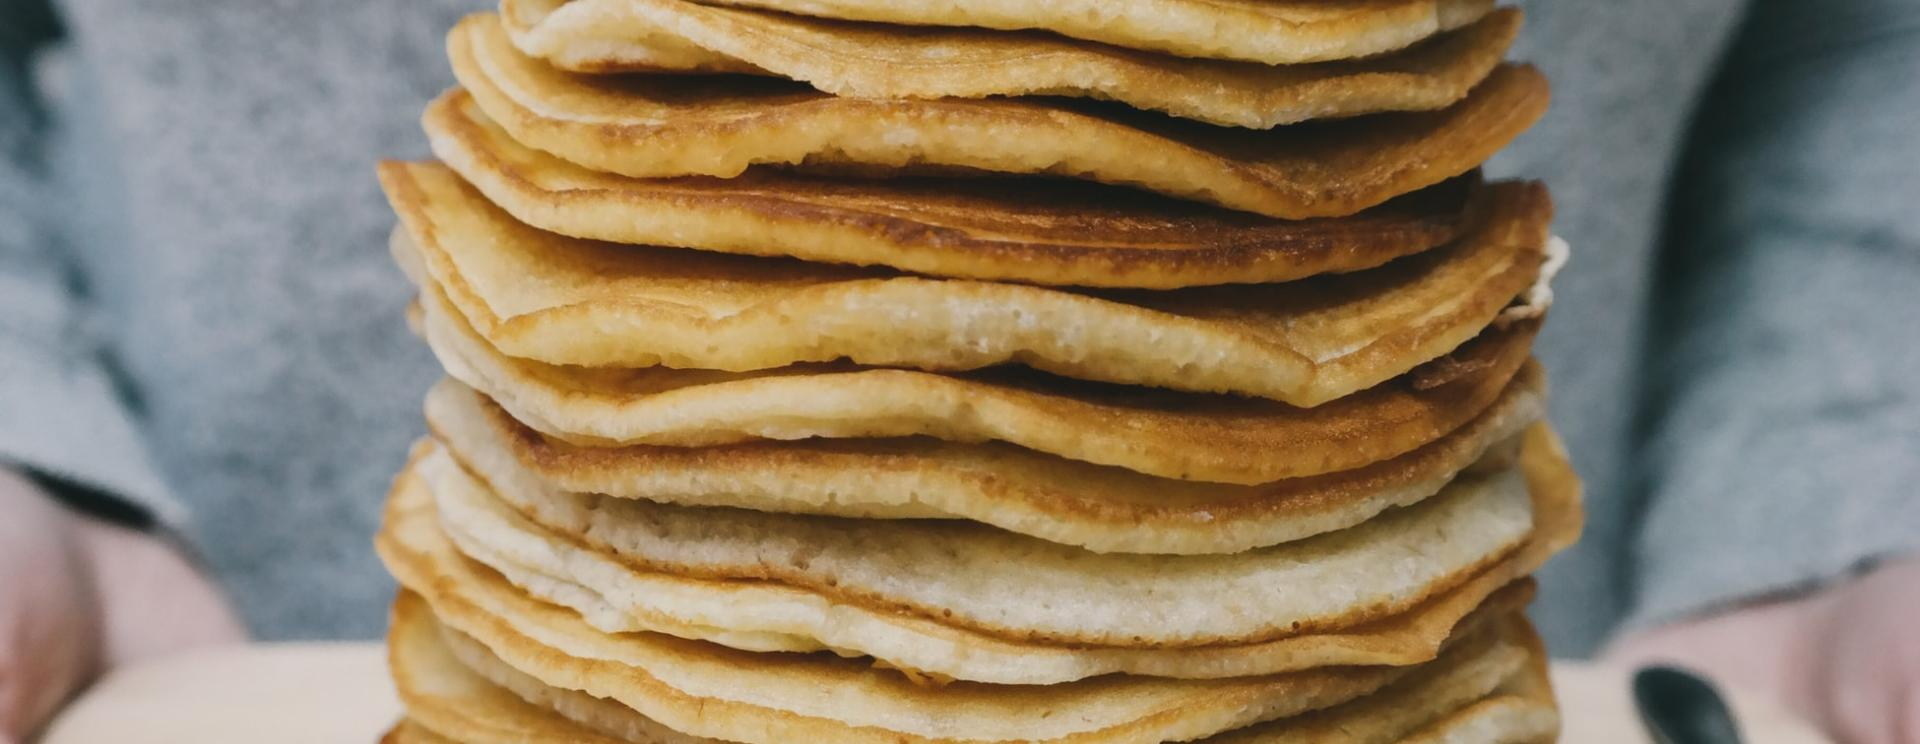 Buffalo Roundup and Arts Festival Pancake Feed